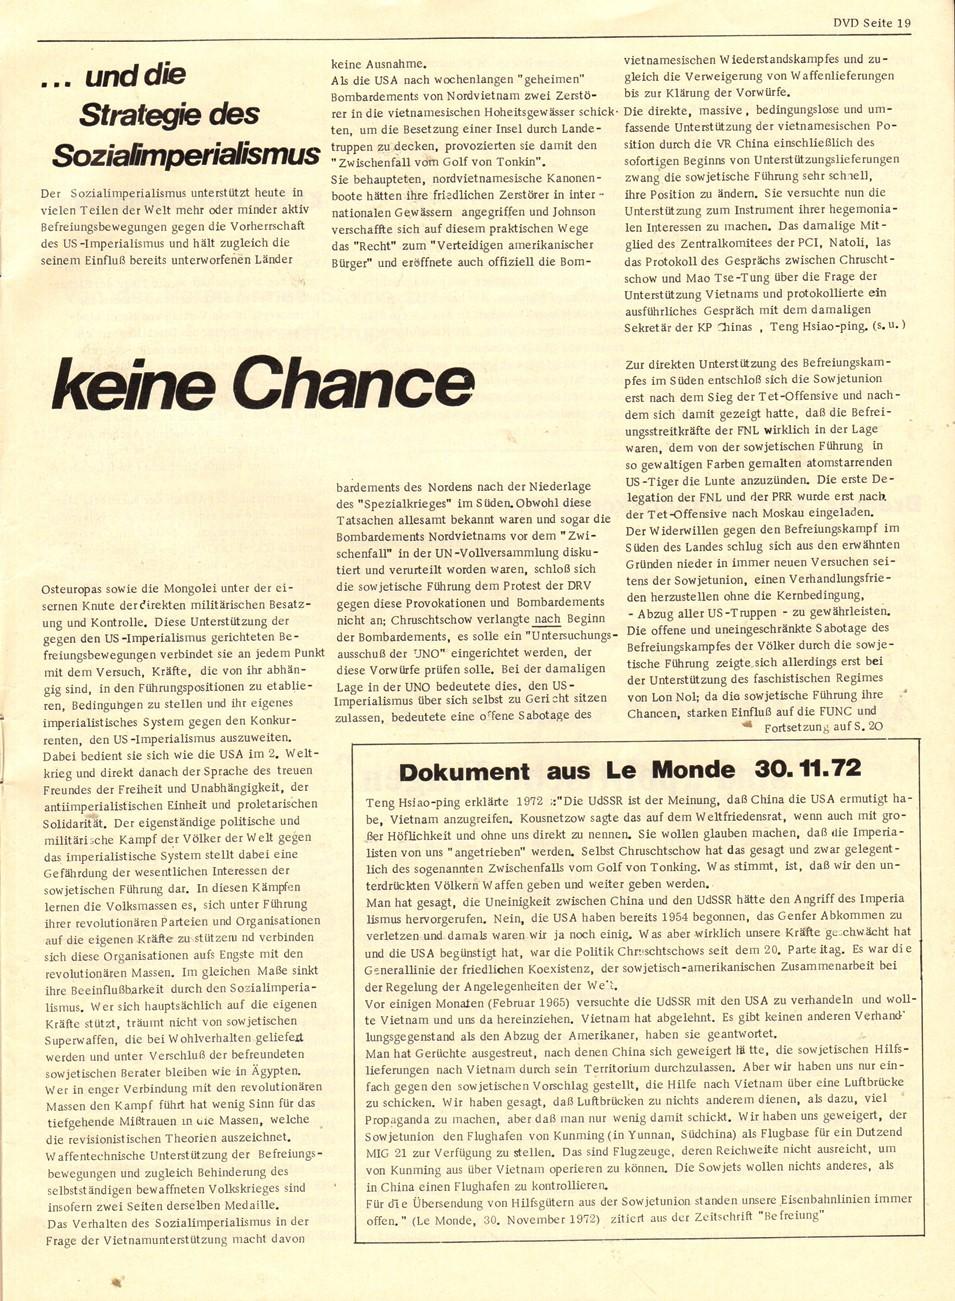 Koeln_KSV_DVD_19750625_19